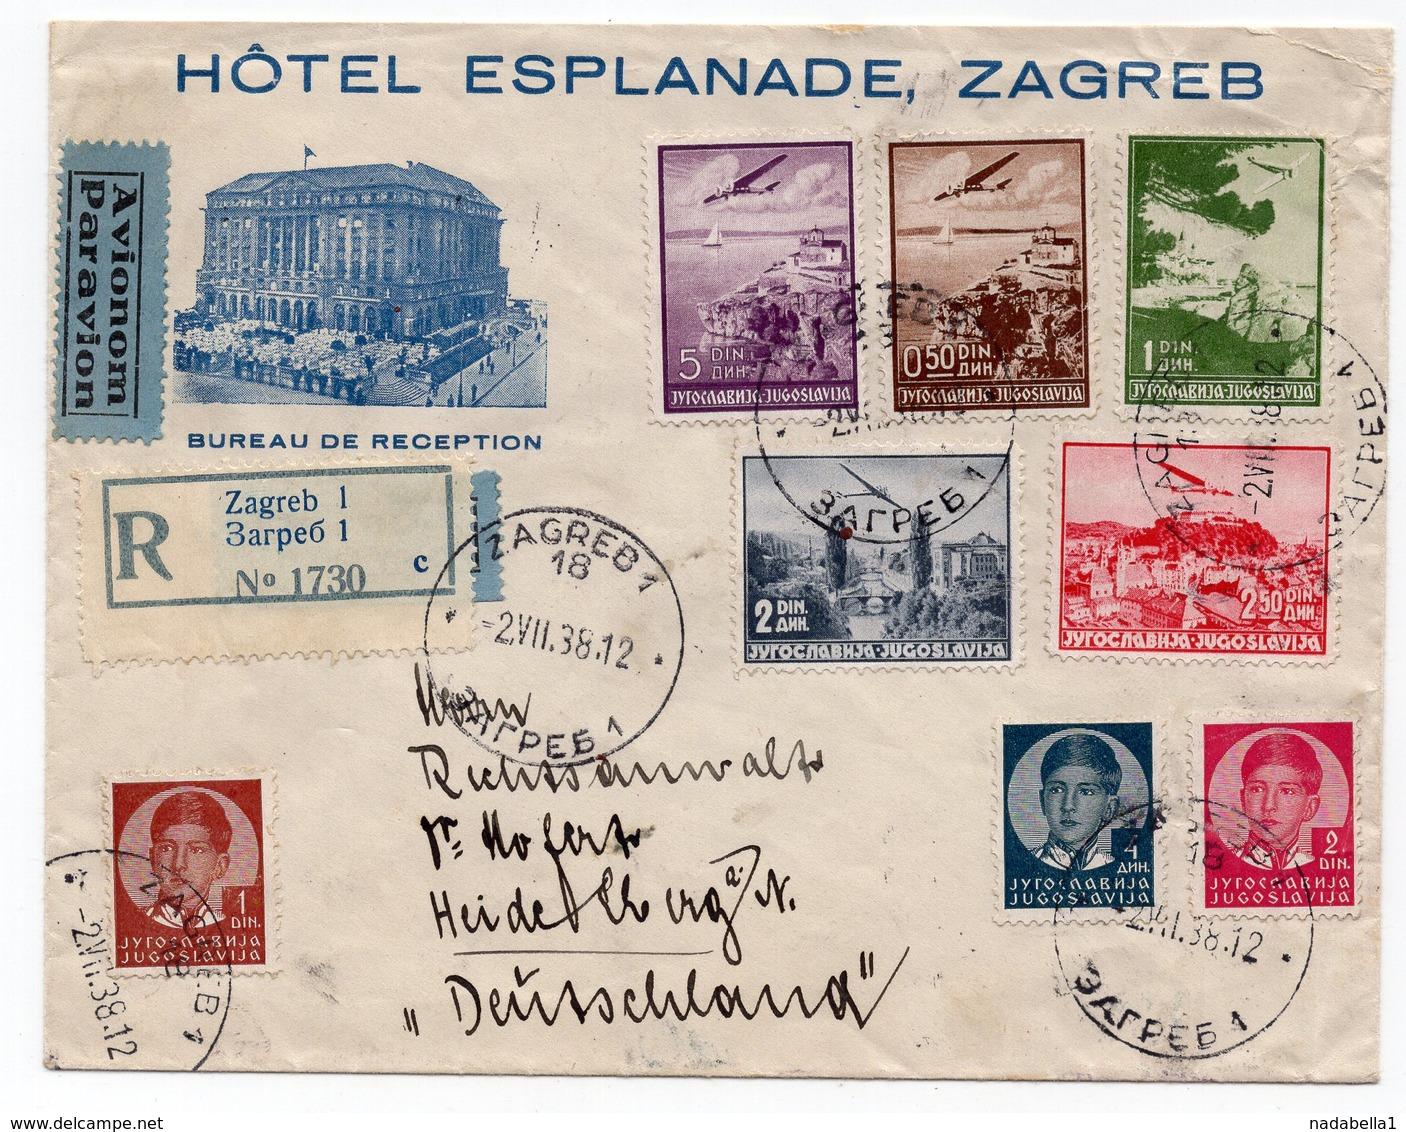 1938 YUGOSLAVIA, CROATIA, HOTEL ESPLANADE ZAGREB TO HEIDELBERG, GERMANY, AIR MAIL, RECORDED - 1931-1941 Kingdom Of Yugoslavia